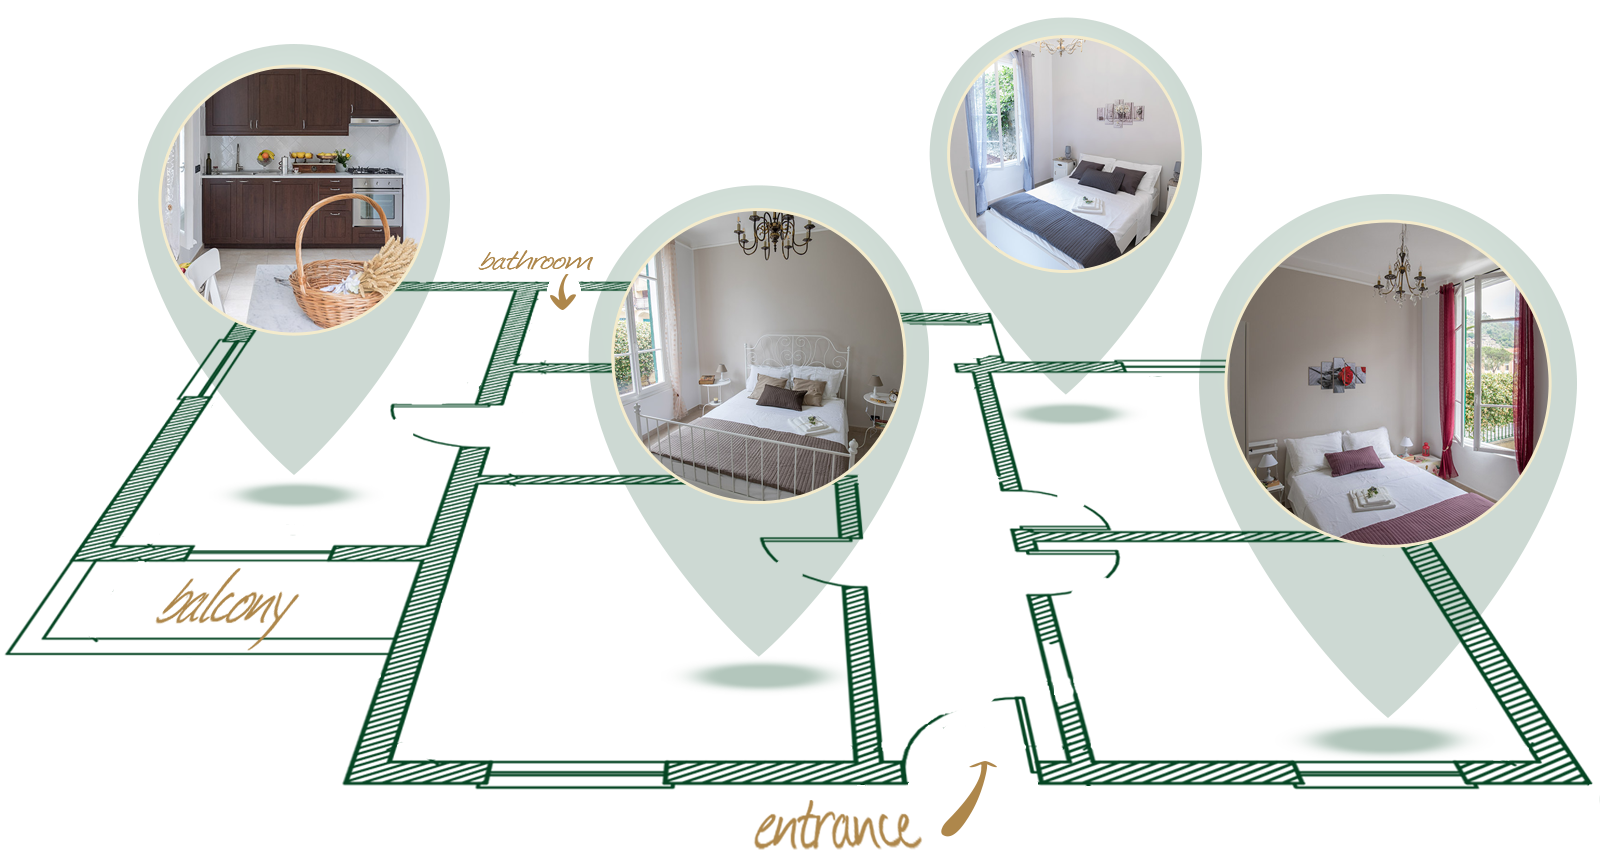 Holiday apartment Dolceacqua - planimetria 3D